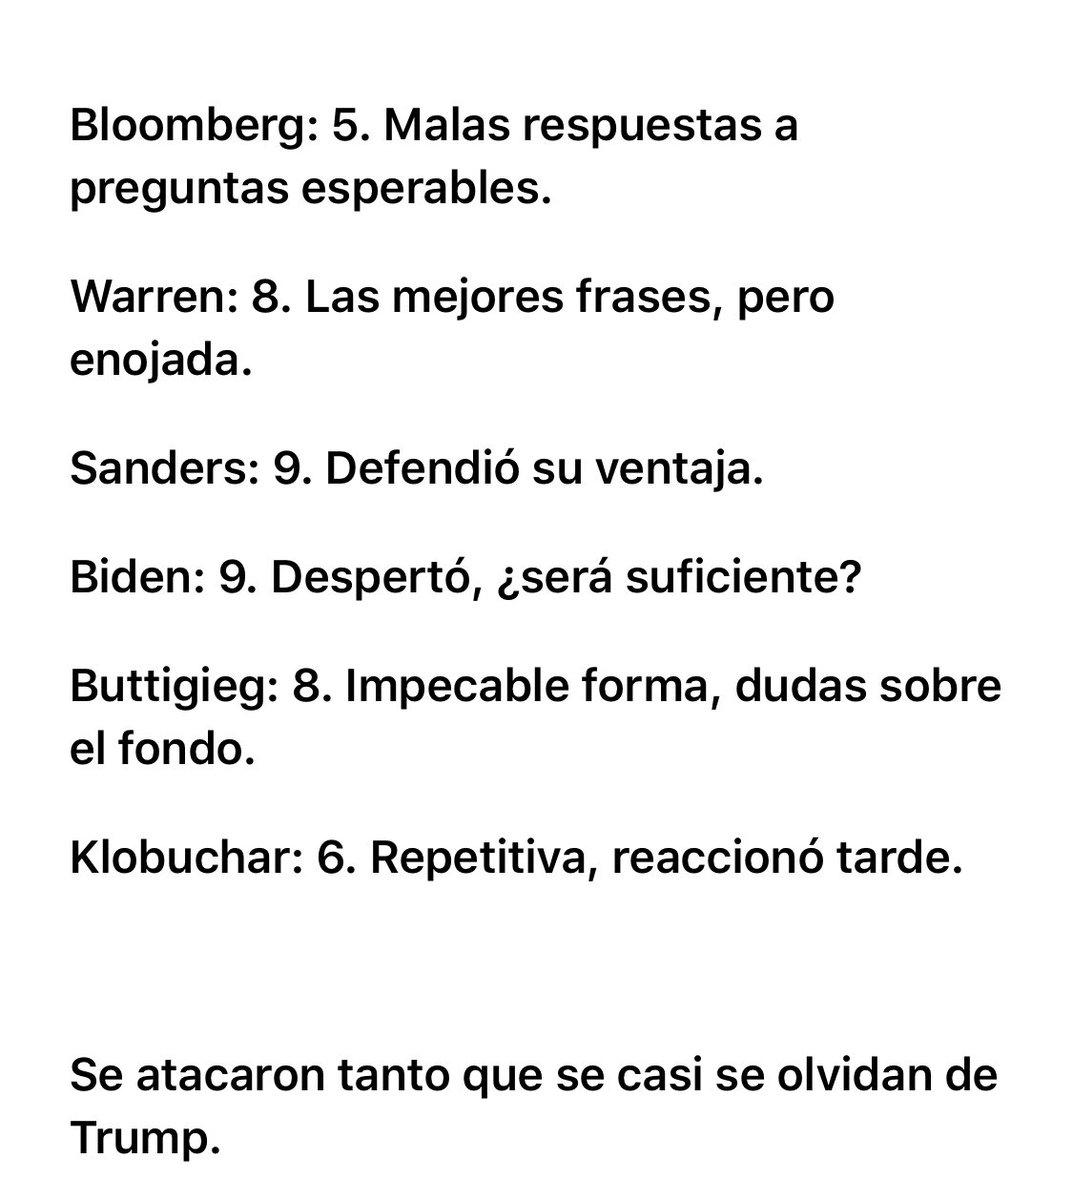 Mis calificaciones del debate presidencial demócrata @MikeBloomberg @ewarren @BernieSanders @JoeBiden @PeteButtigieg @amyklobuchar @latinus_us #Informaciónparati